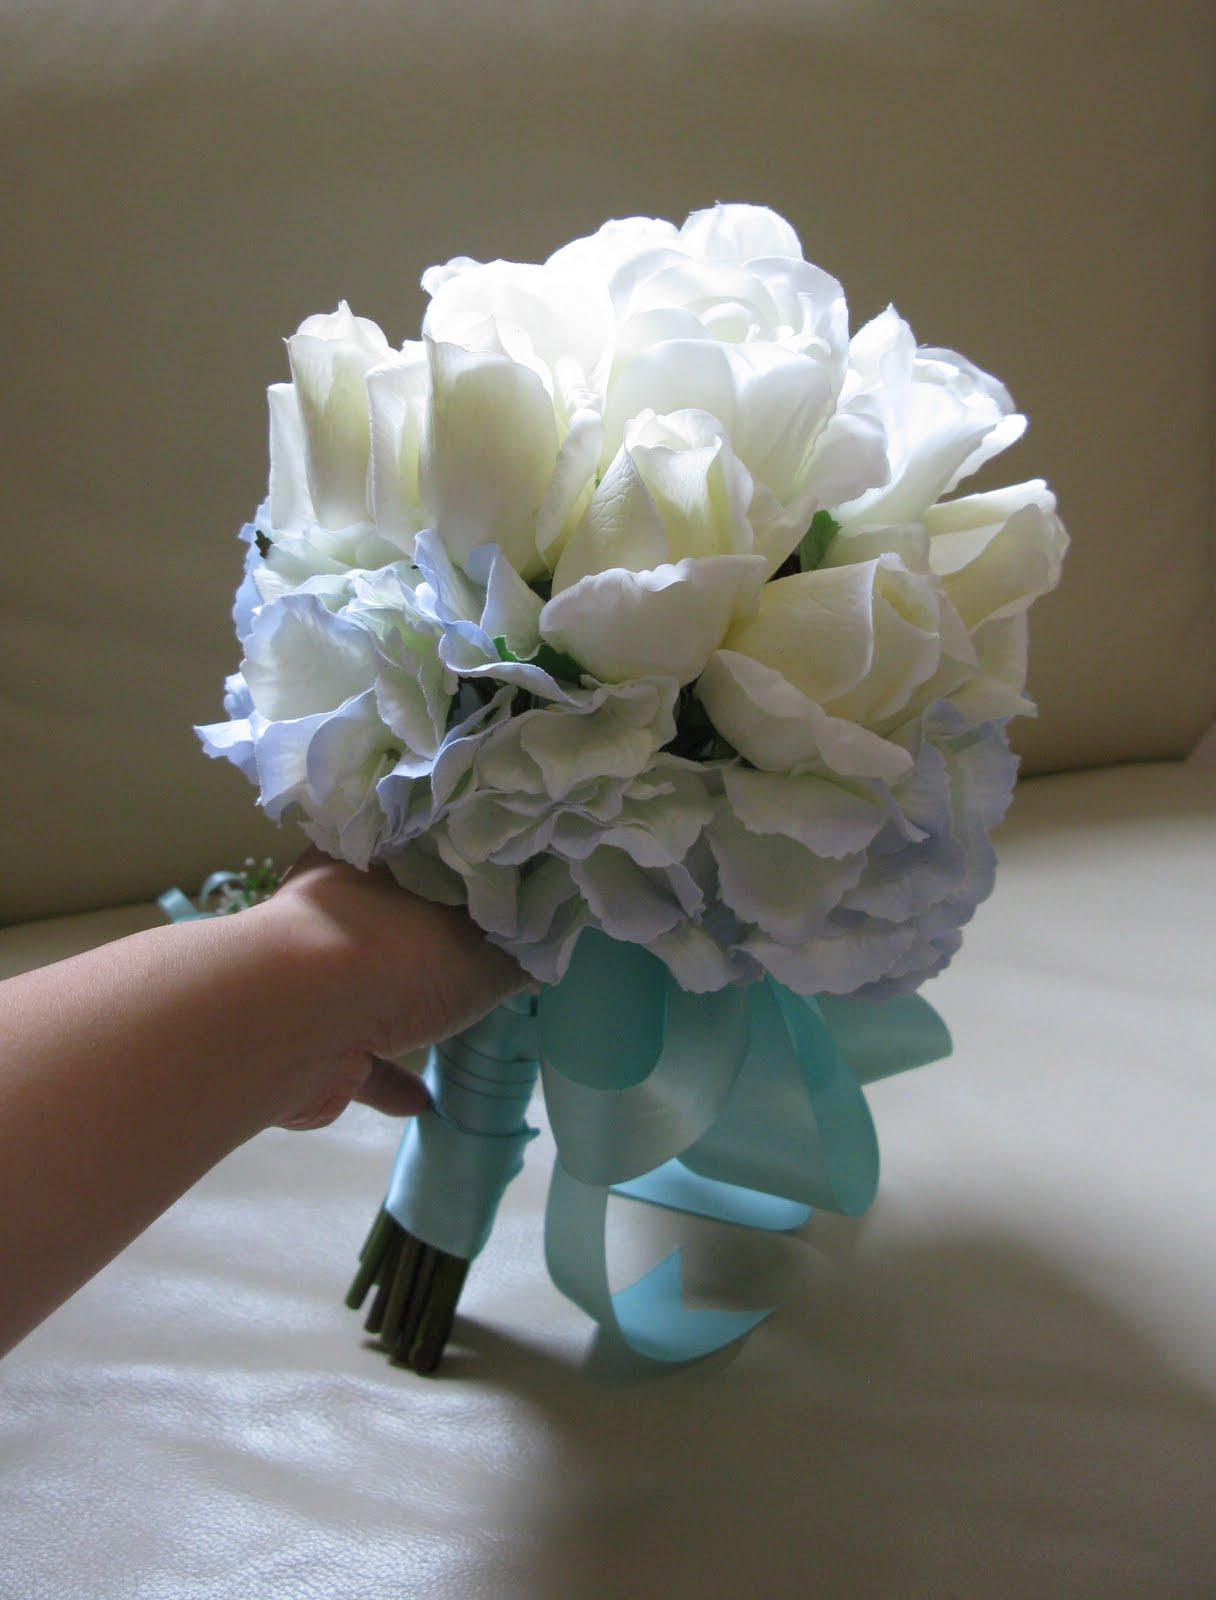 hydrangea light blue bouquet - Google Search | Blue ... |Light Blue Hydrangea Bouquet